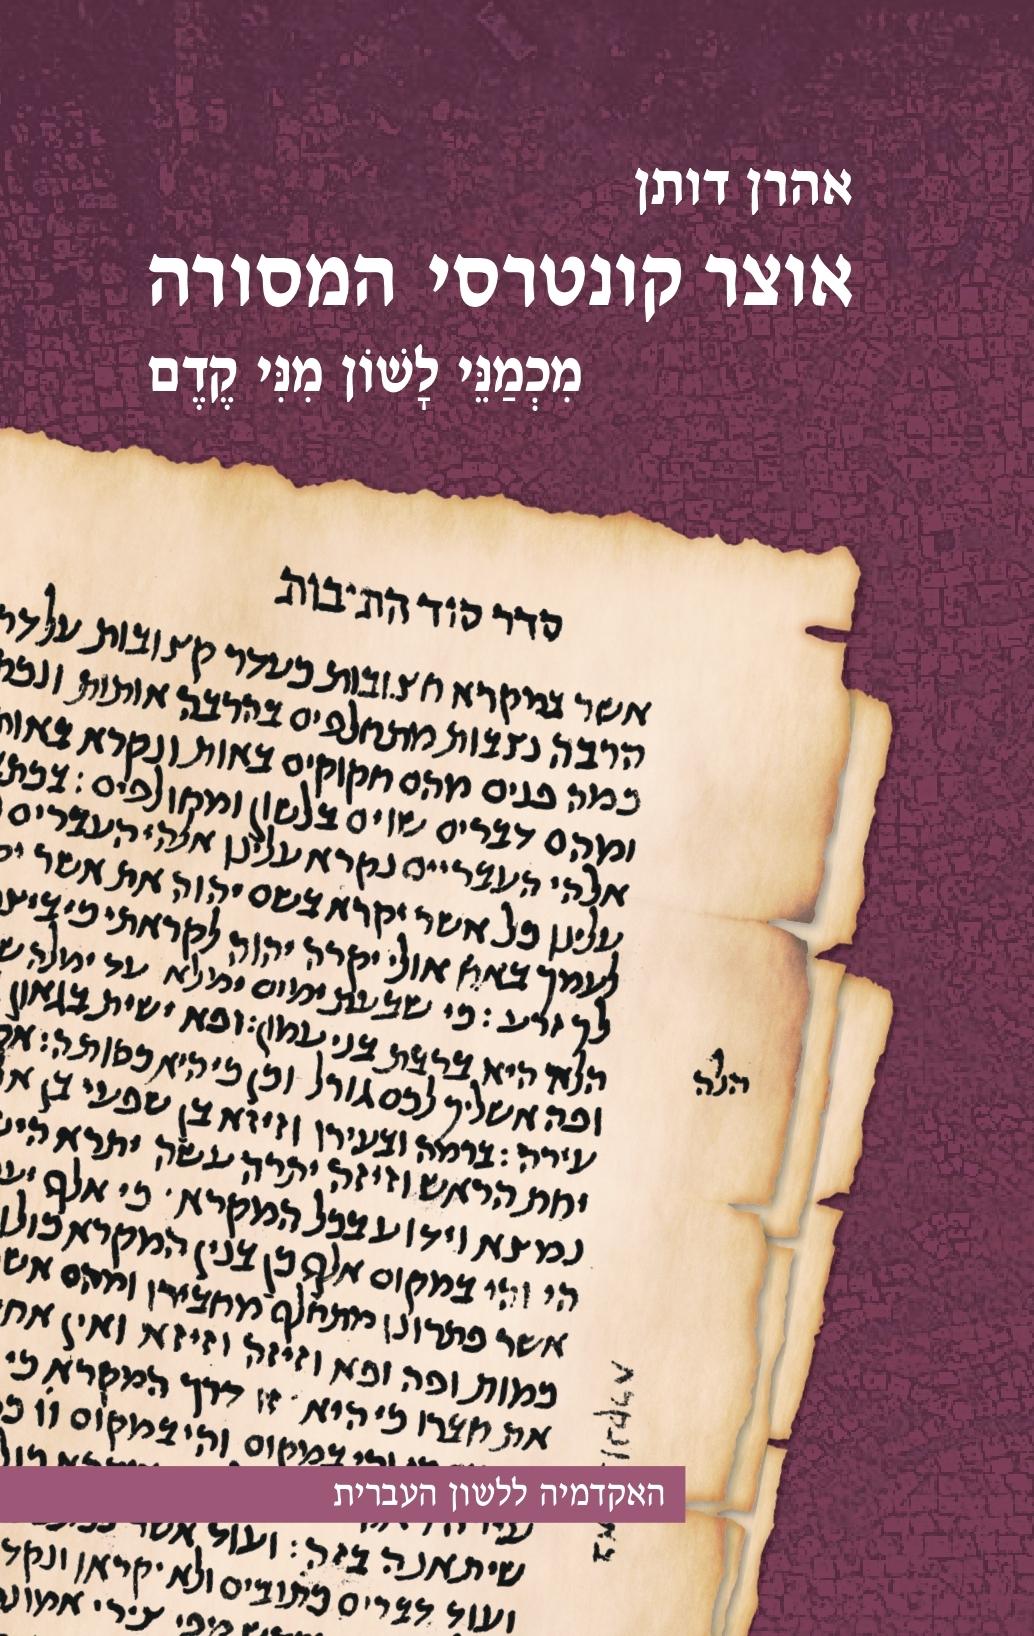 Thesaurus of Quntrese Ha-Masora